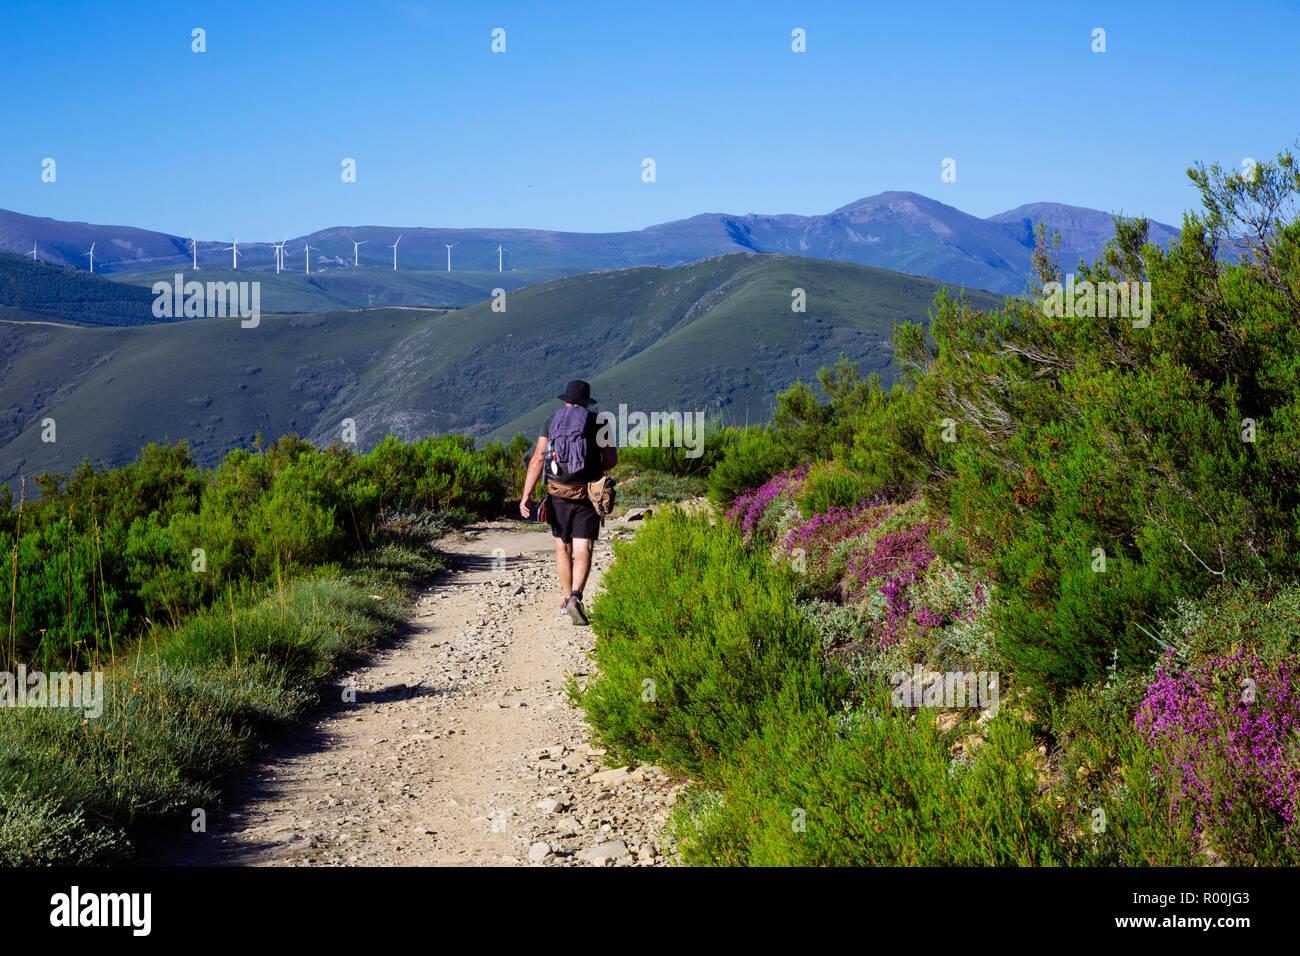 Camino de Santiago (Spain) - Pilgrims walking along the way of St.James, in the Bierzo green landscape Stock Photo